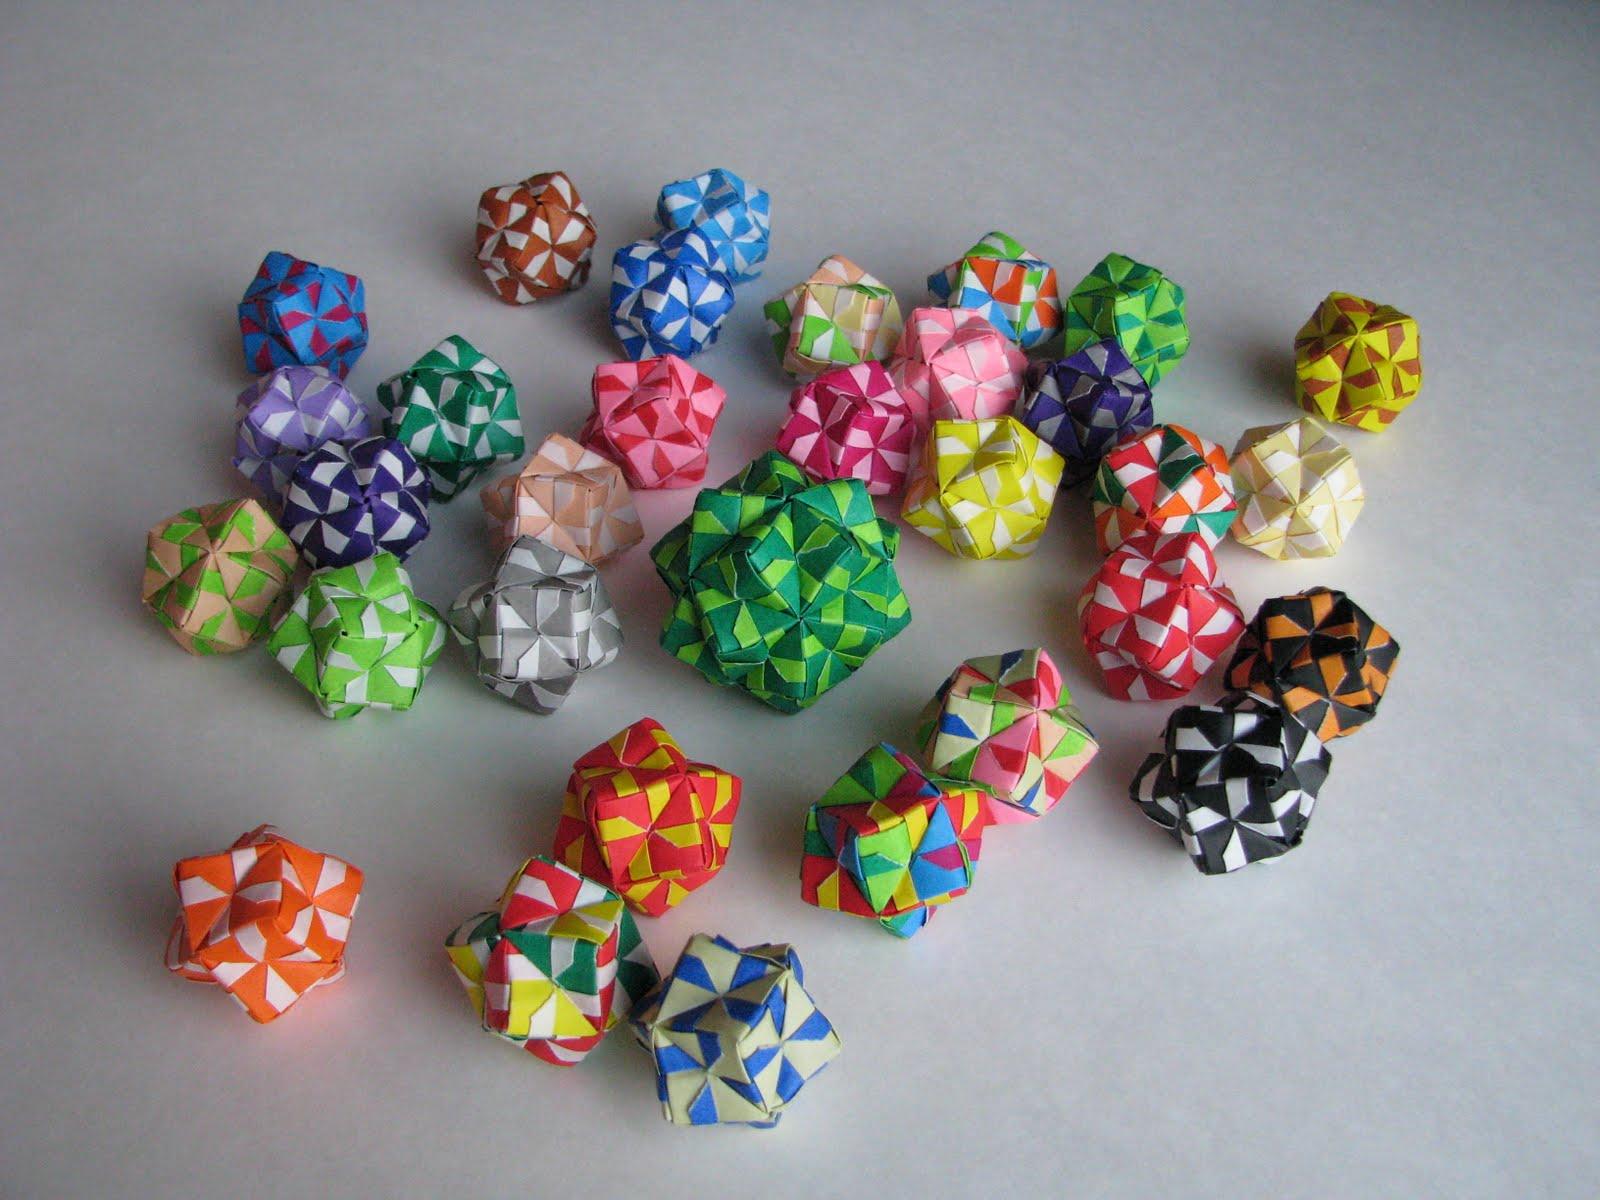 Lots of Origami Balls